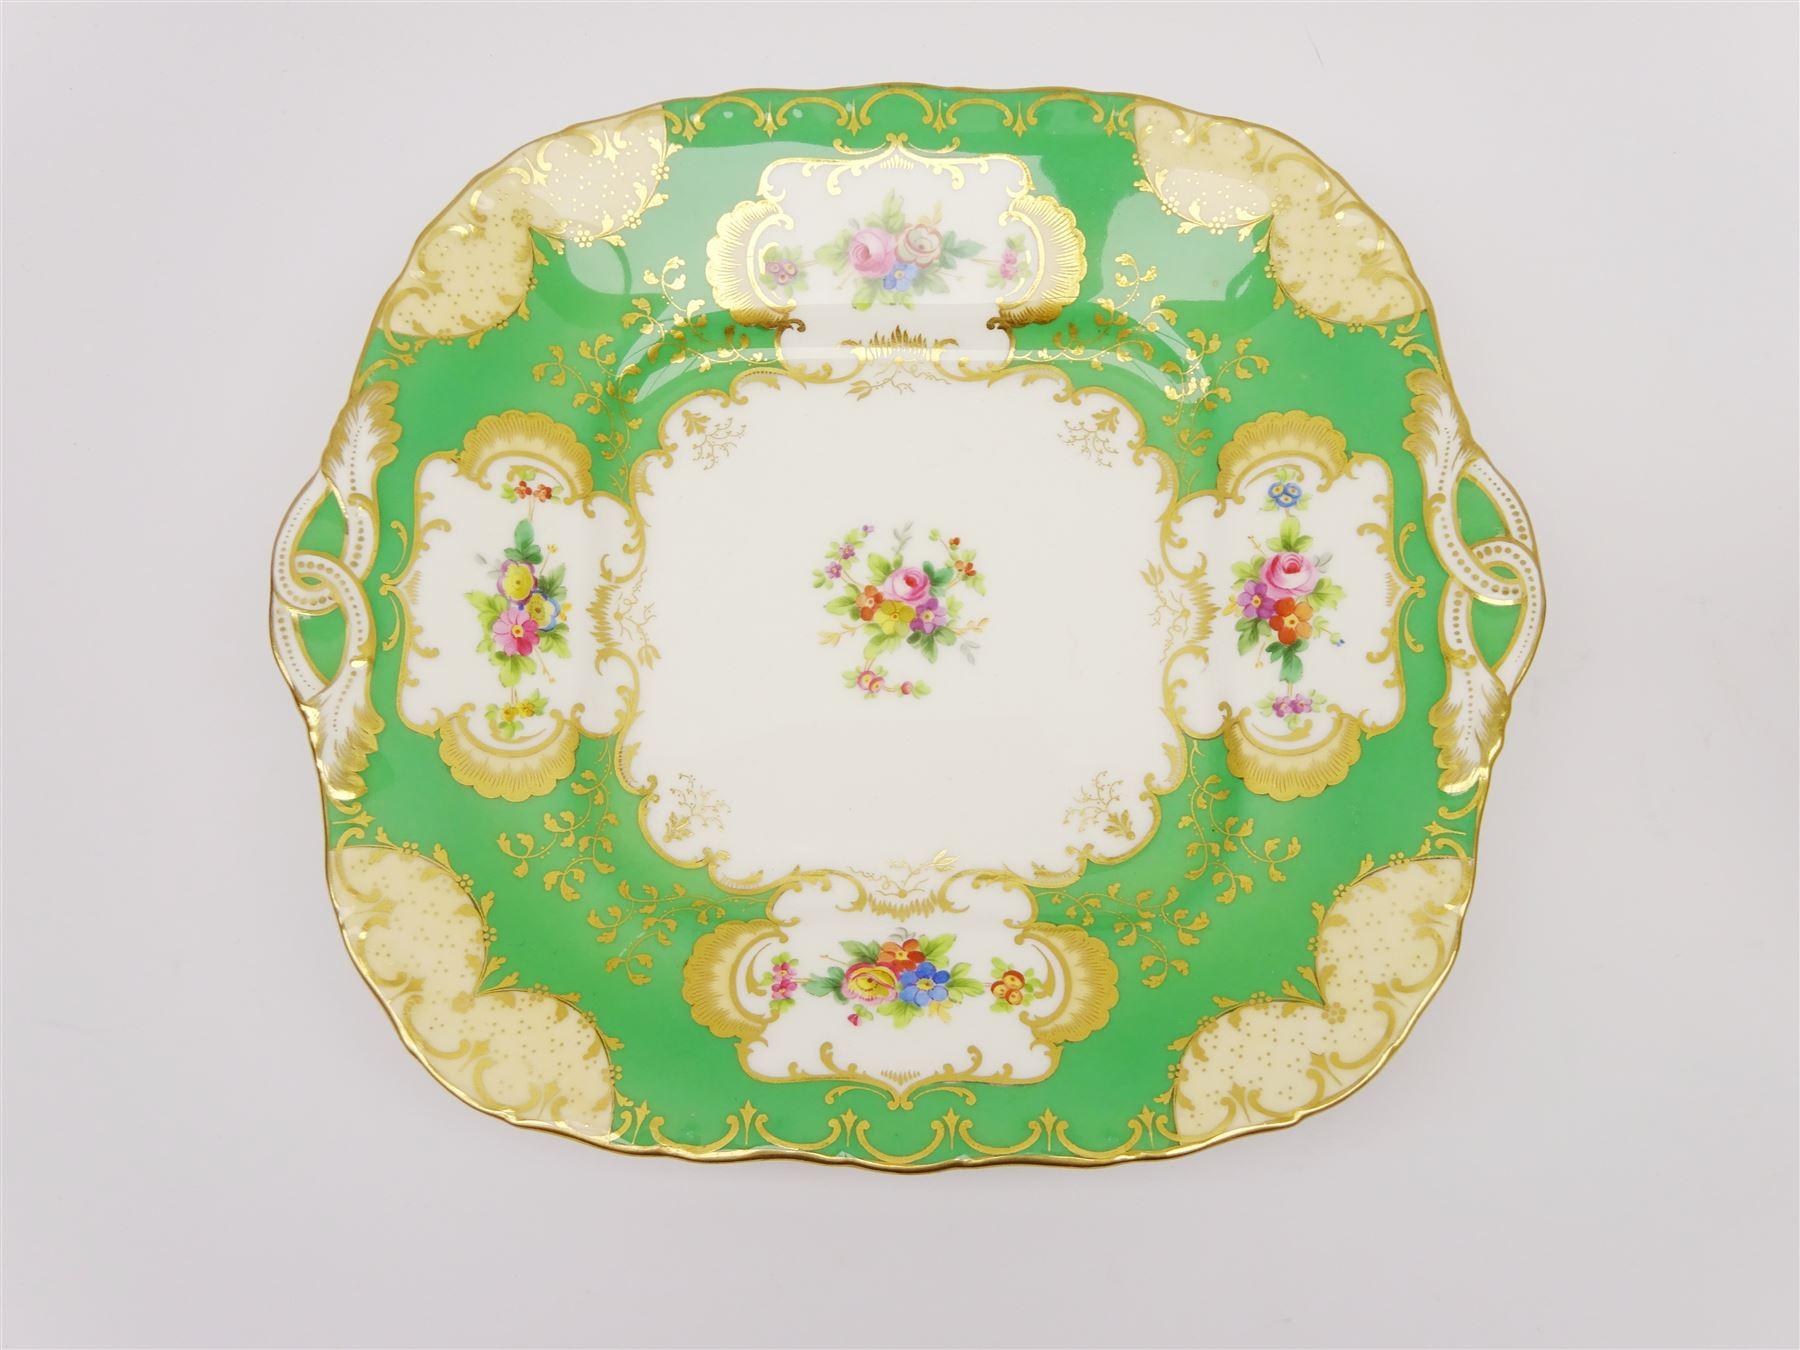 19th century Minton tea set - Image 5 of 12